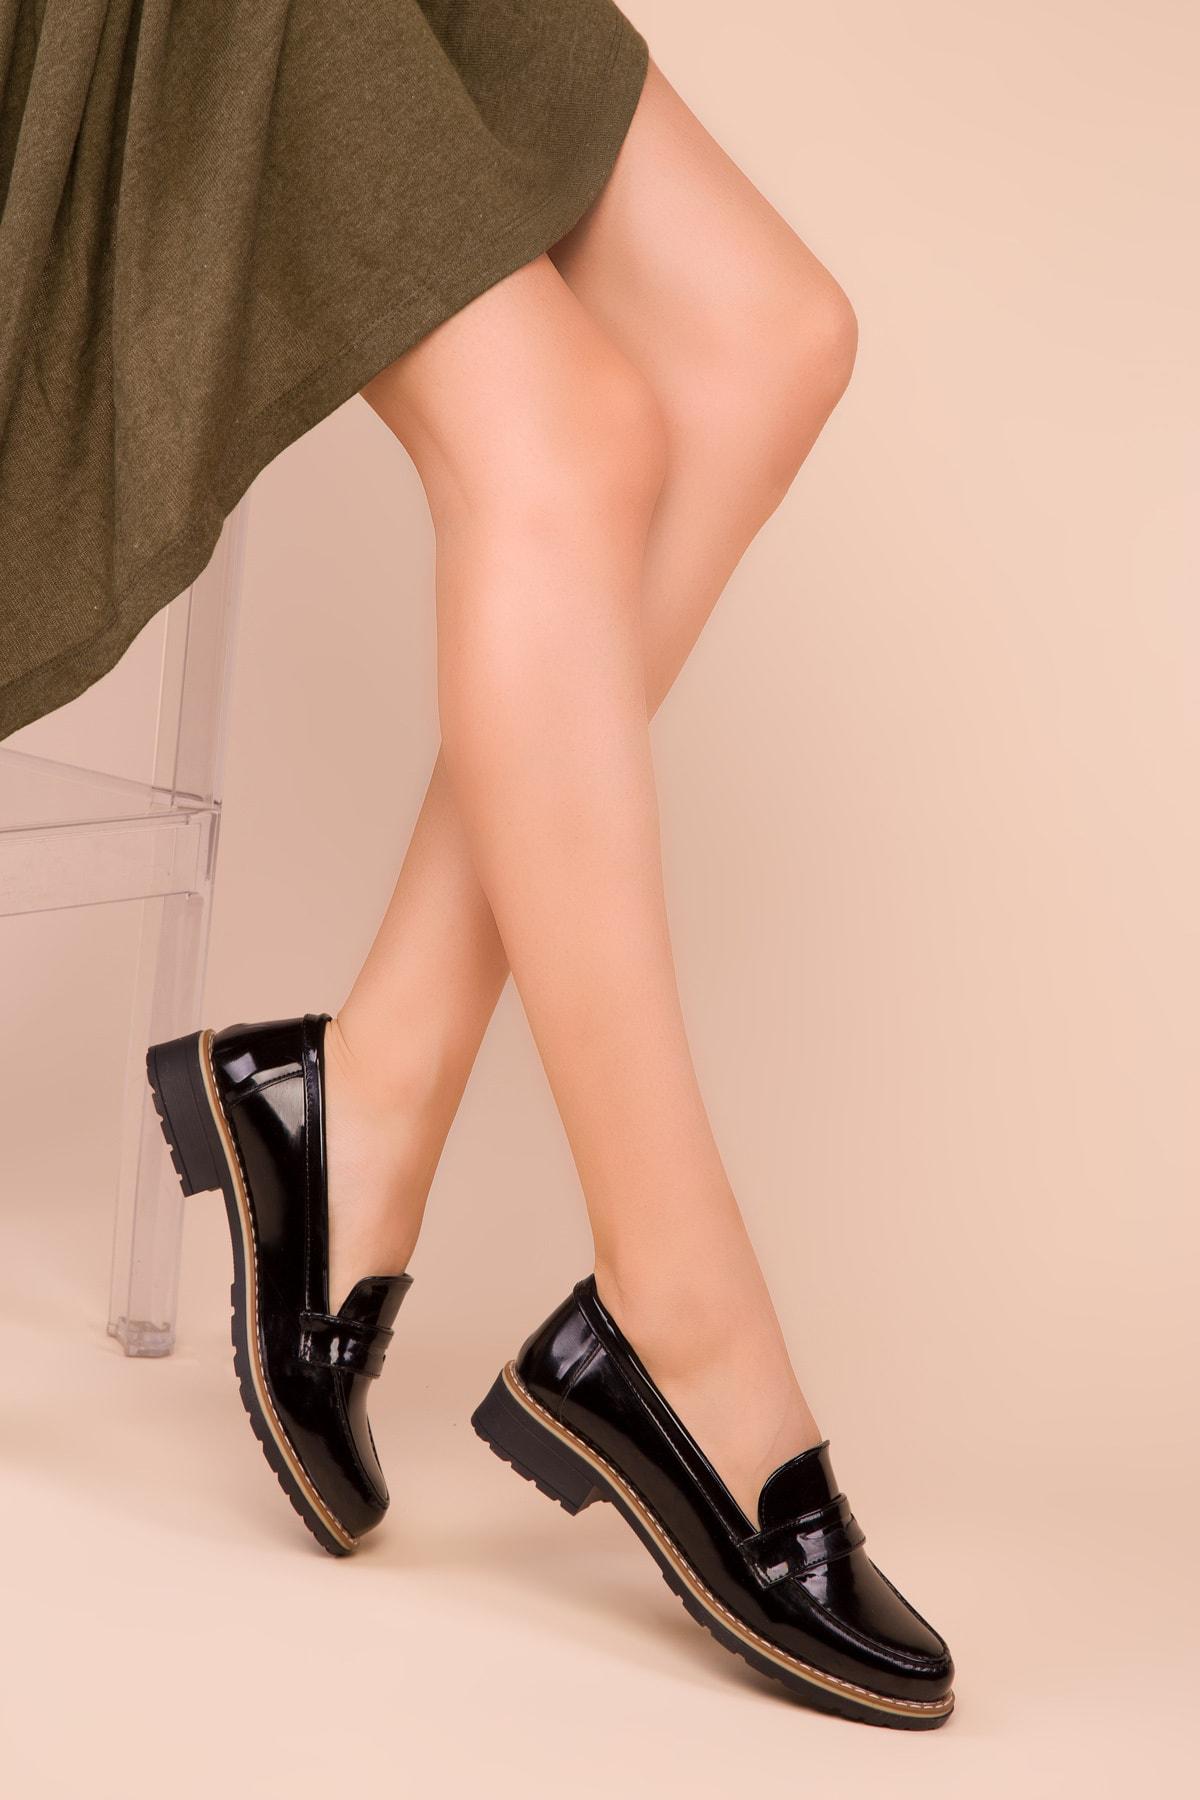 SOHO Siyah Rugan Kadın Casual Ayakkabı 15471 2